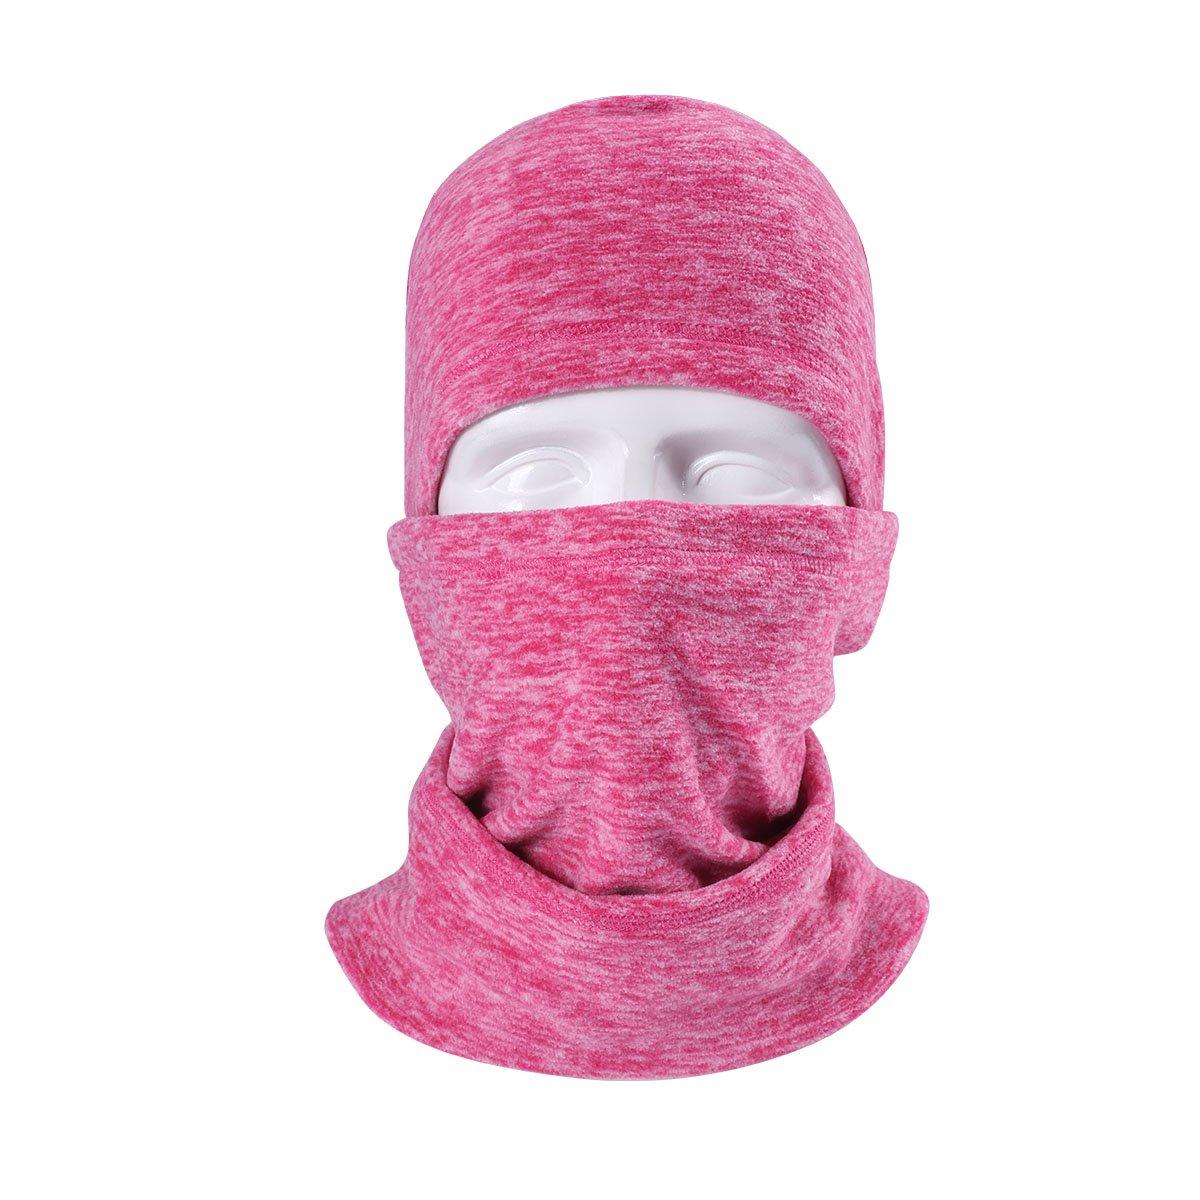 Runtlly Winter Heavyweight Mask Warm Windproof Balaclava Motorcycle Tactical Skiing Face Mask LightCoral